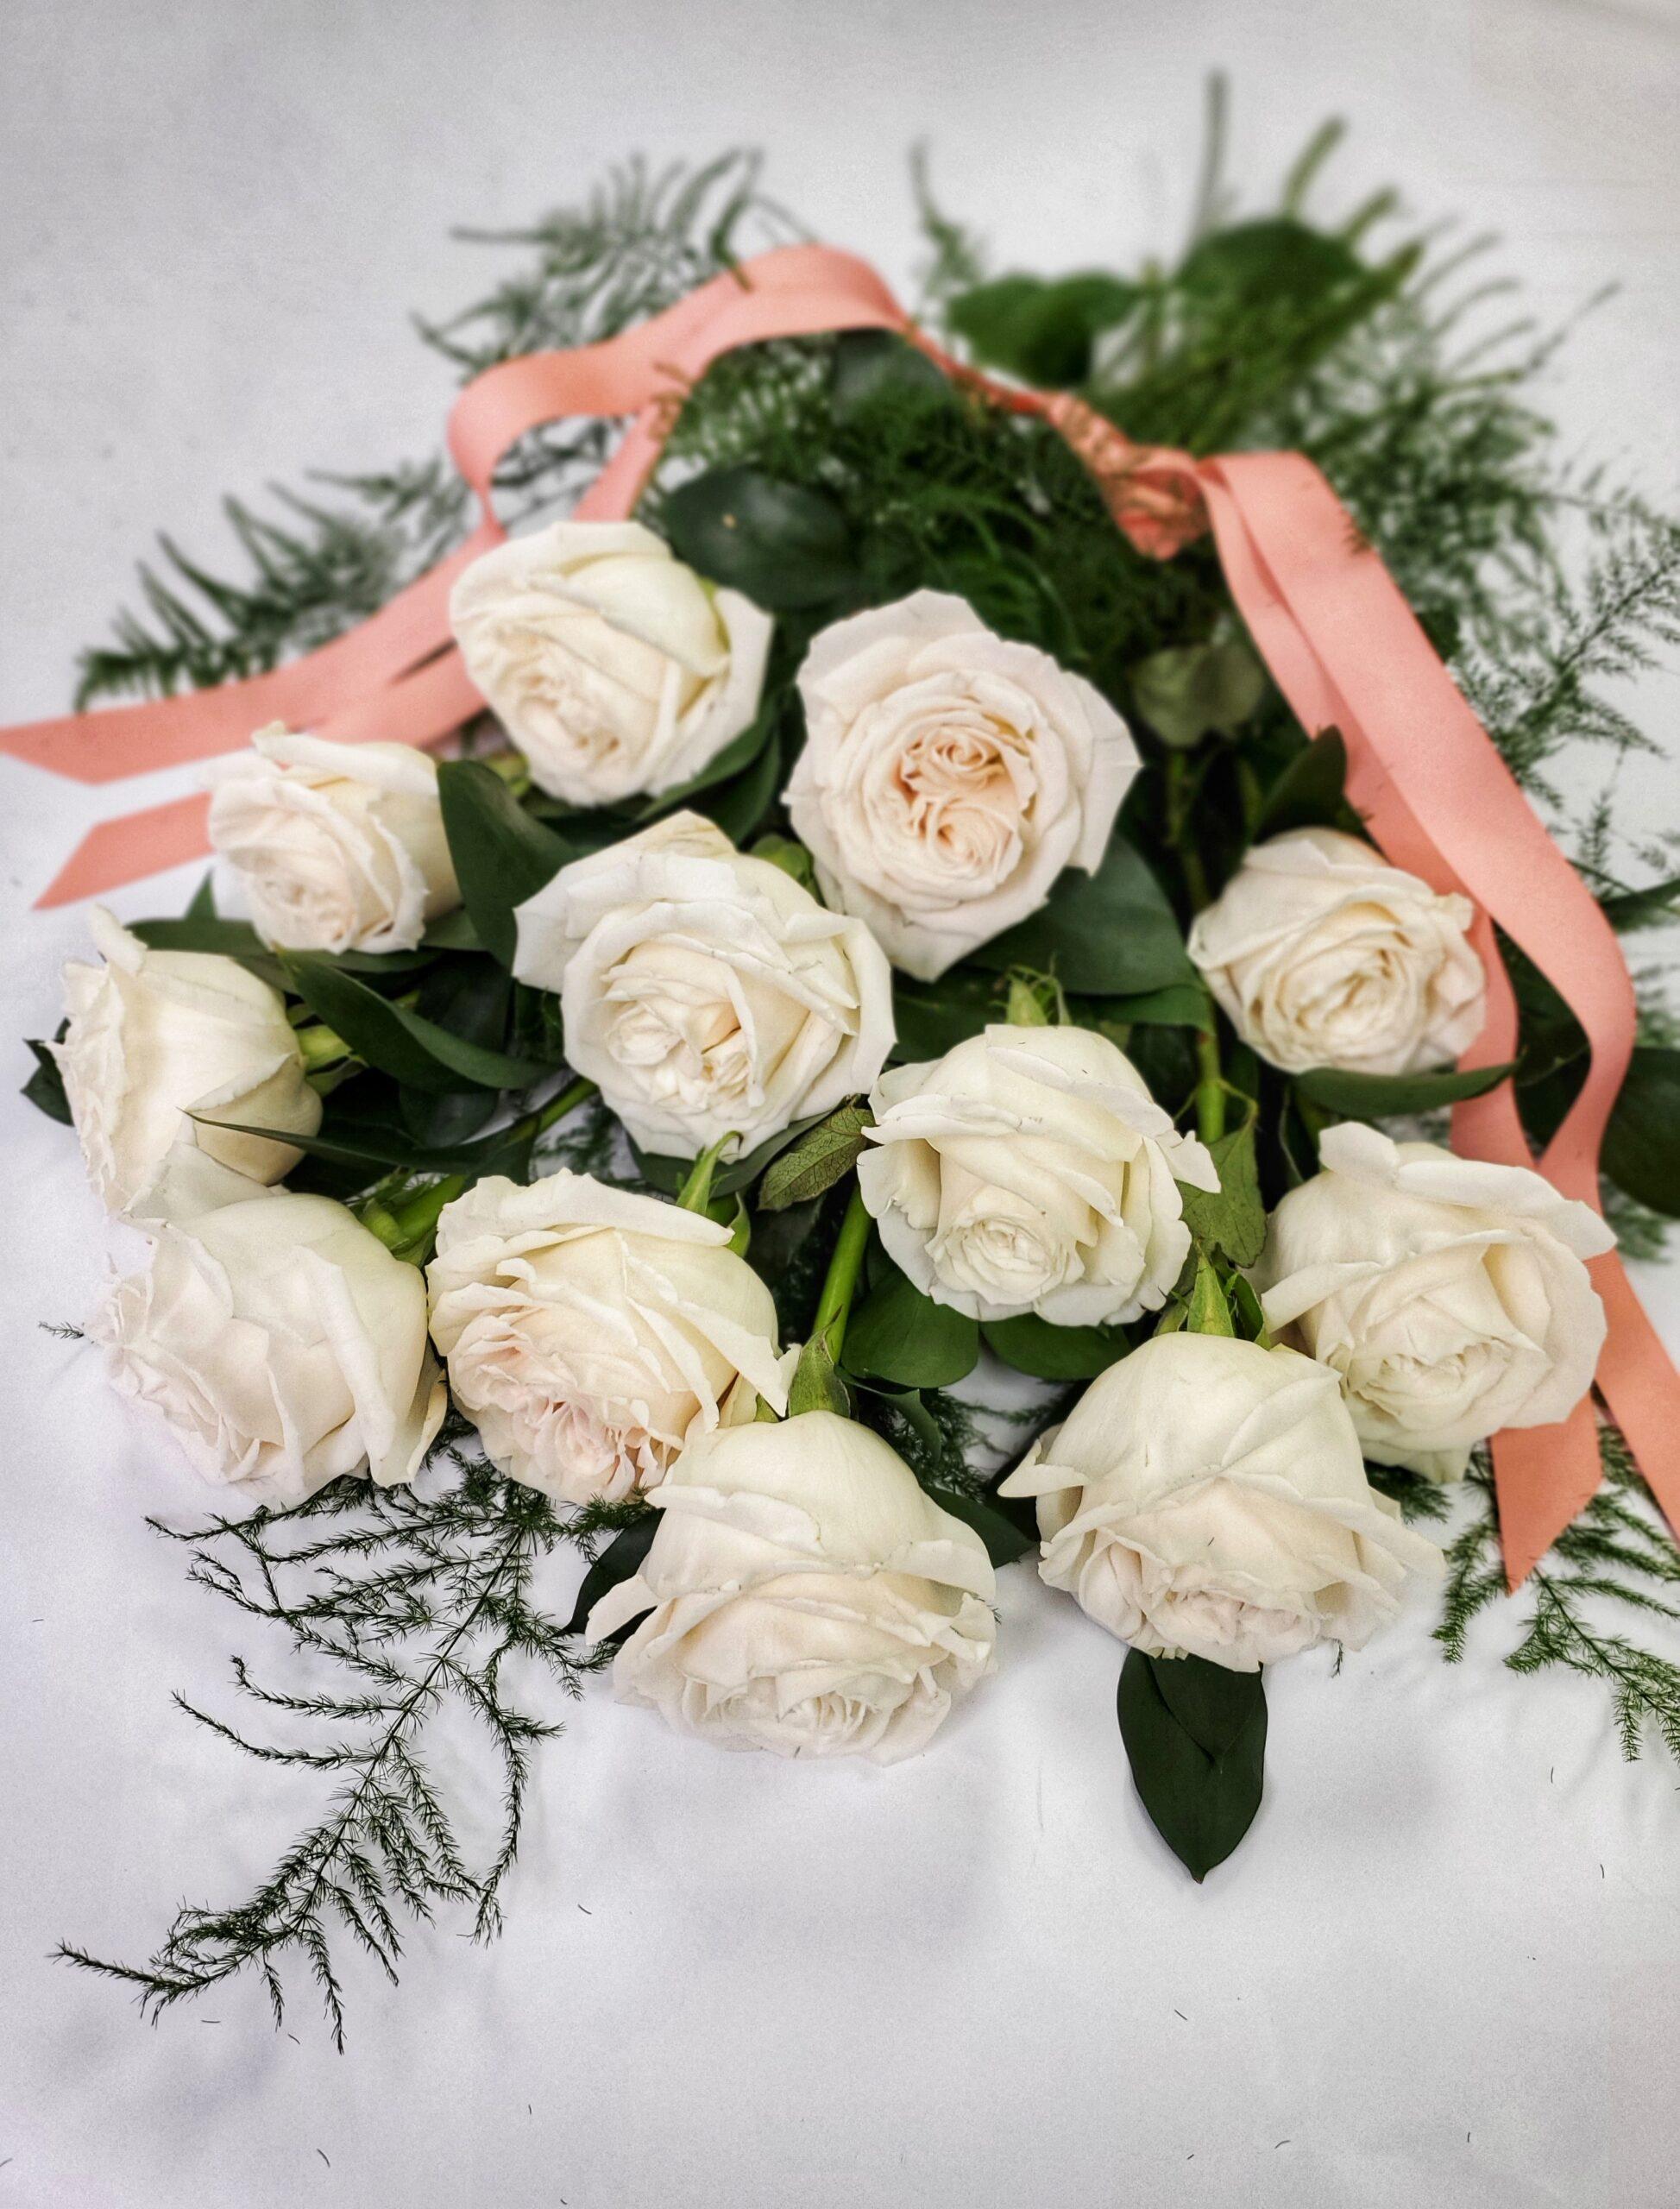 vday-Dozen Roses White